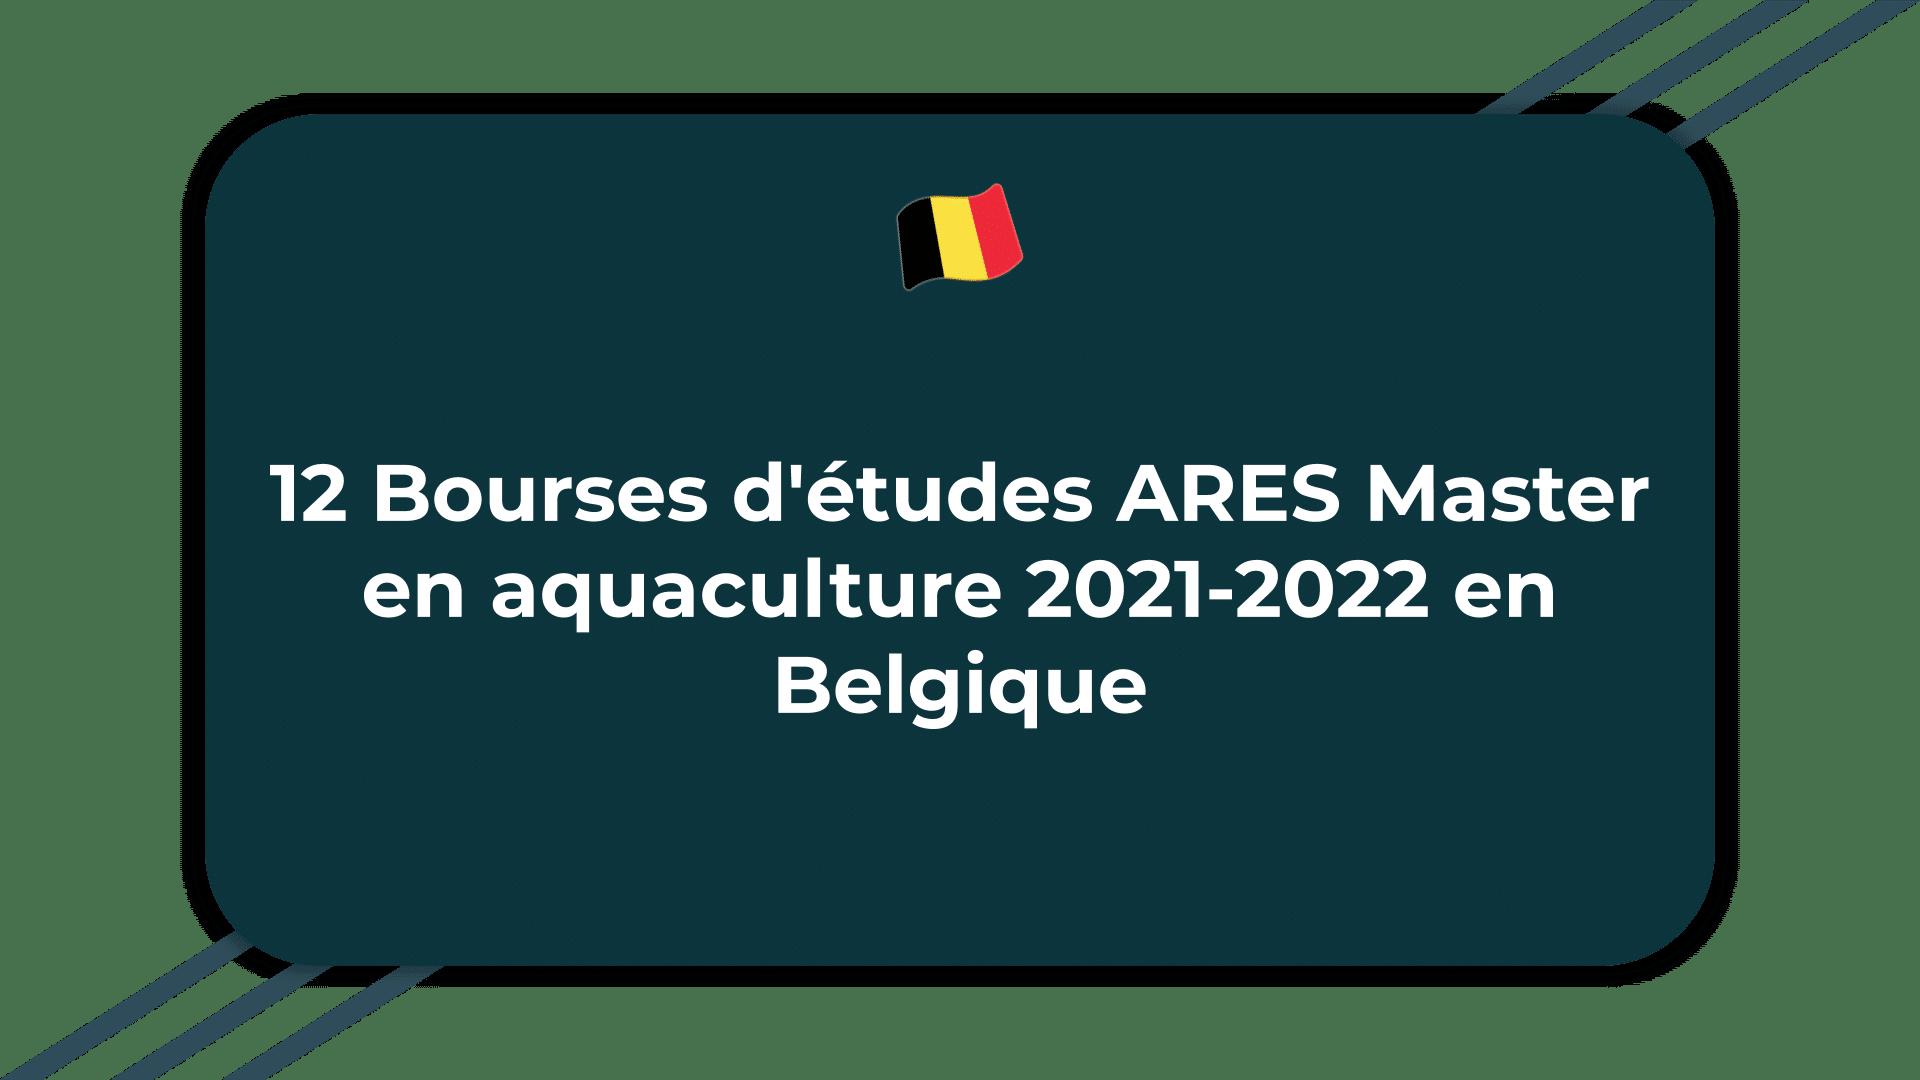 12 Bourses d'études ARES Master en aquaculture